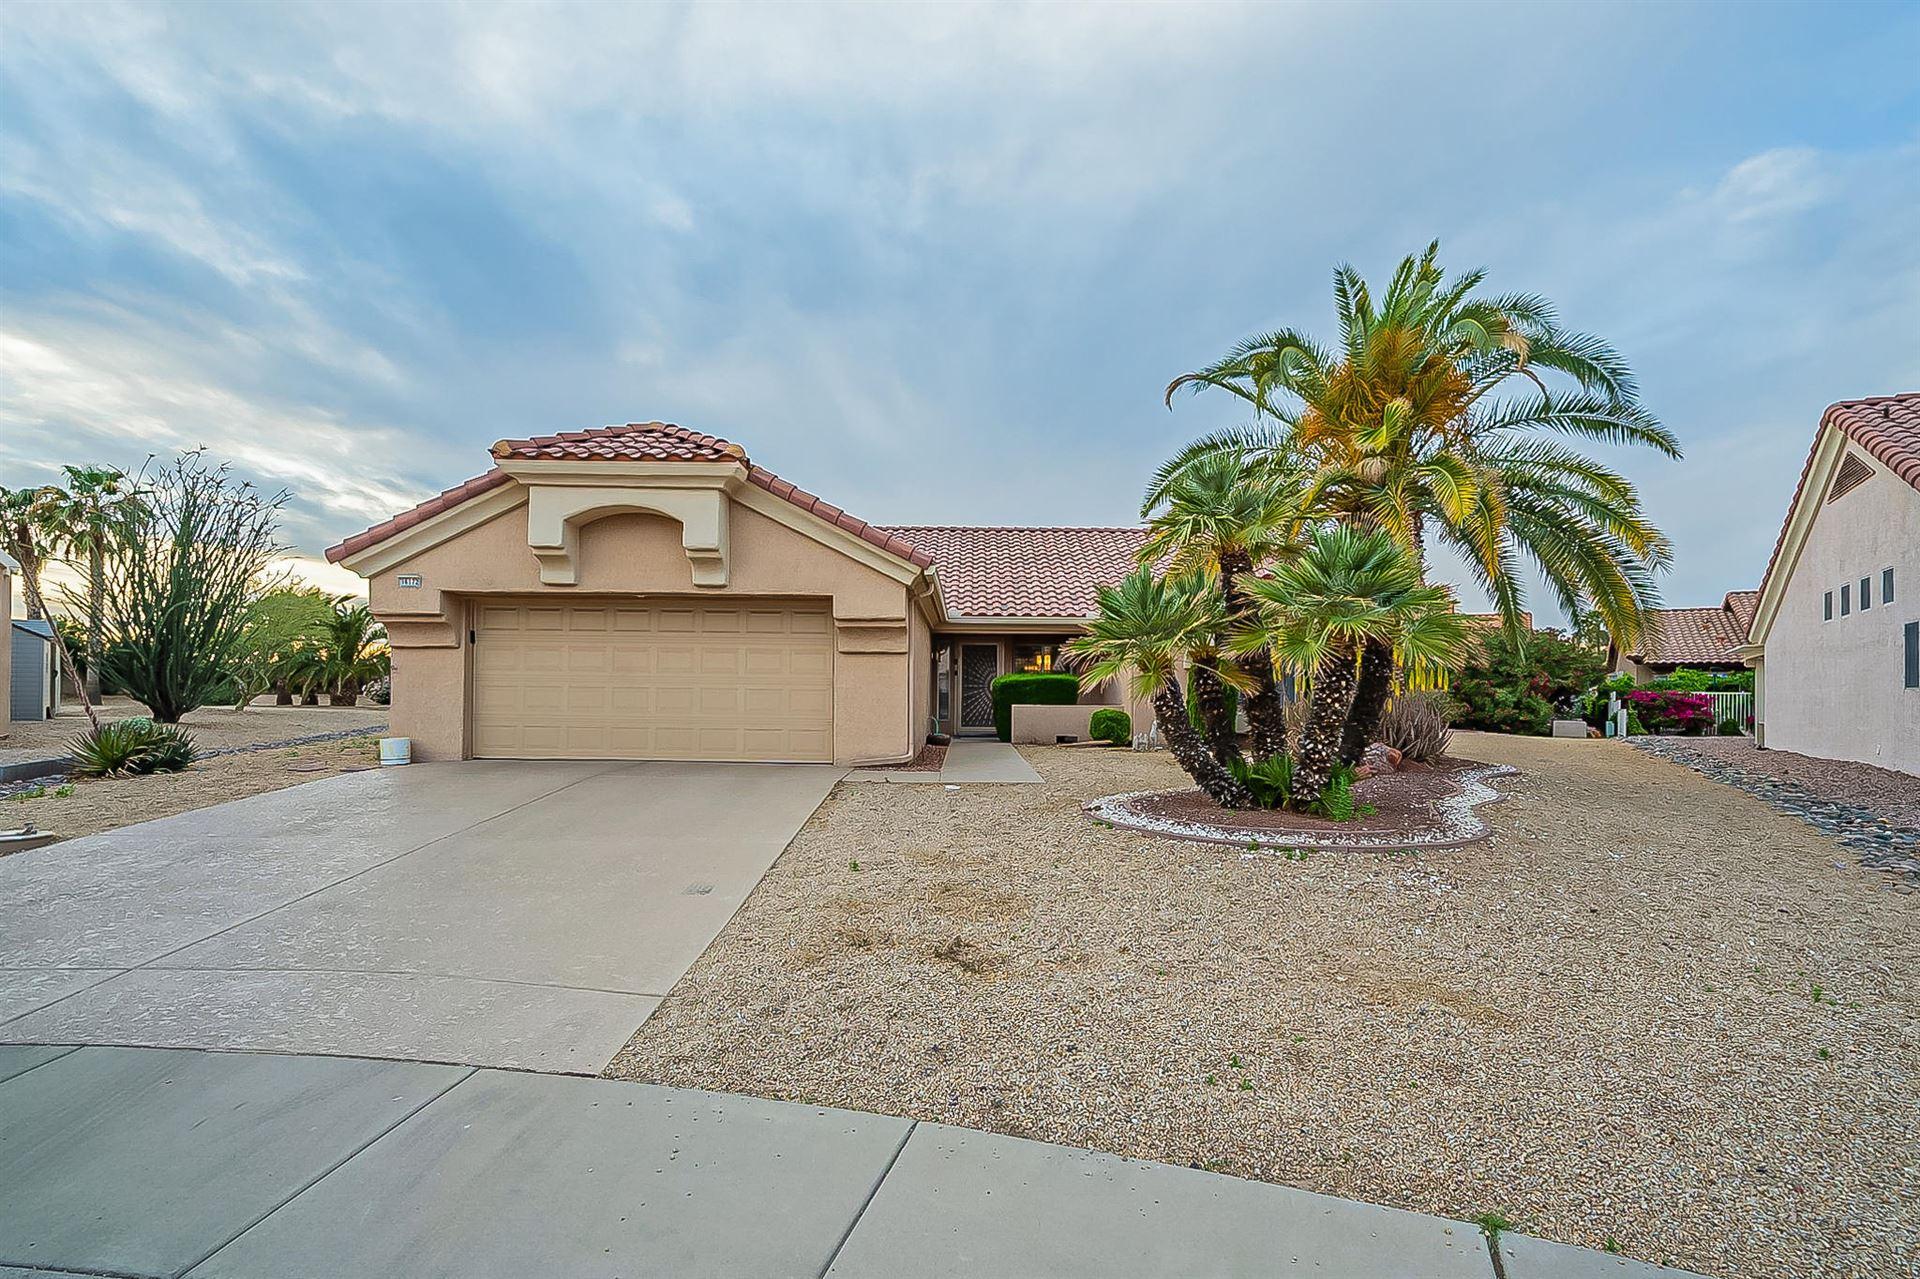 Photo of 16172 W SENTINEL Drive, Sun City West, AZ 85375 (MLS # 6221419)